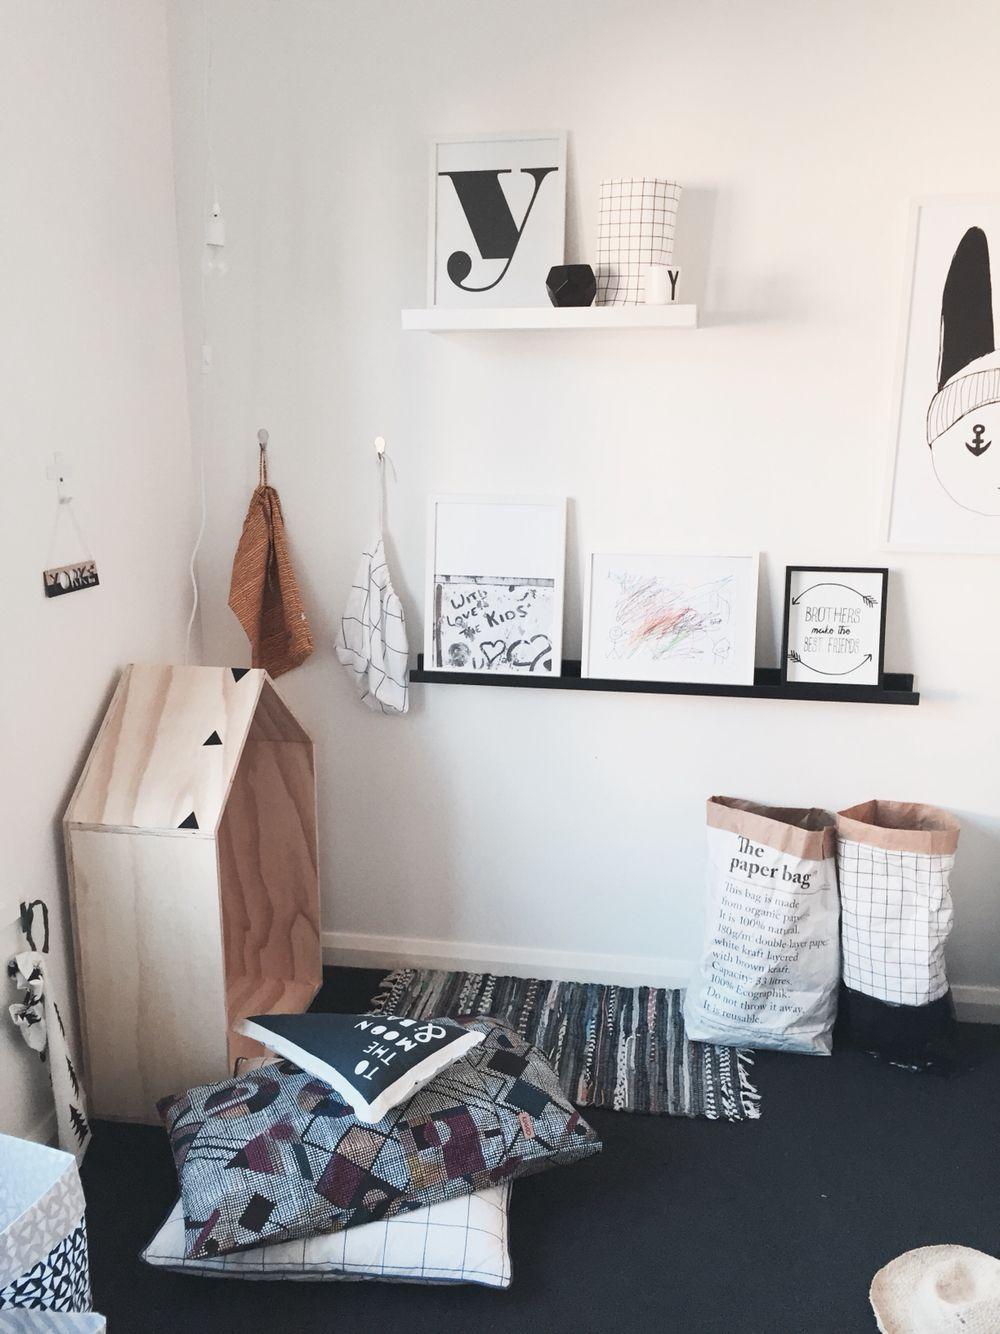 Minimalist boys interior style, using Yorkelee kids wall art prints, shop online, prints starting at $7. Yorkelee.com.au